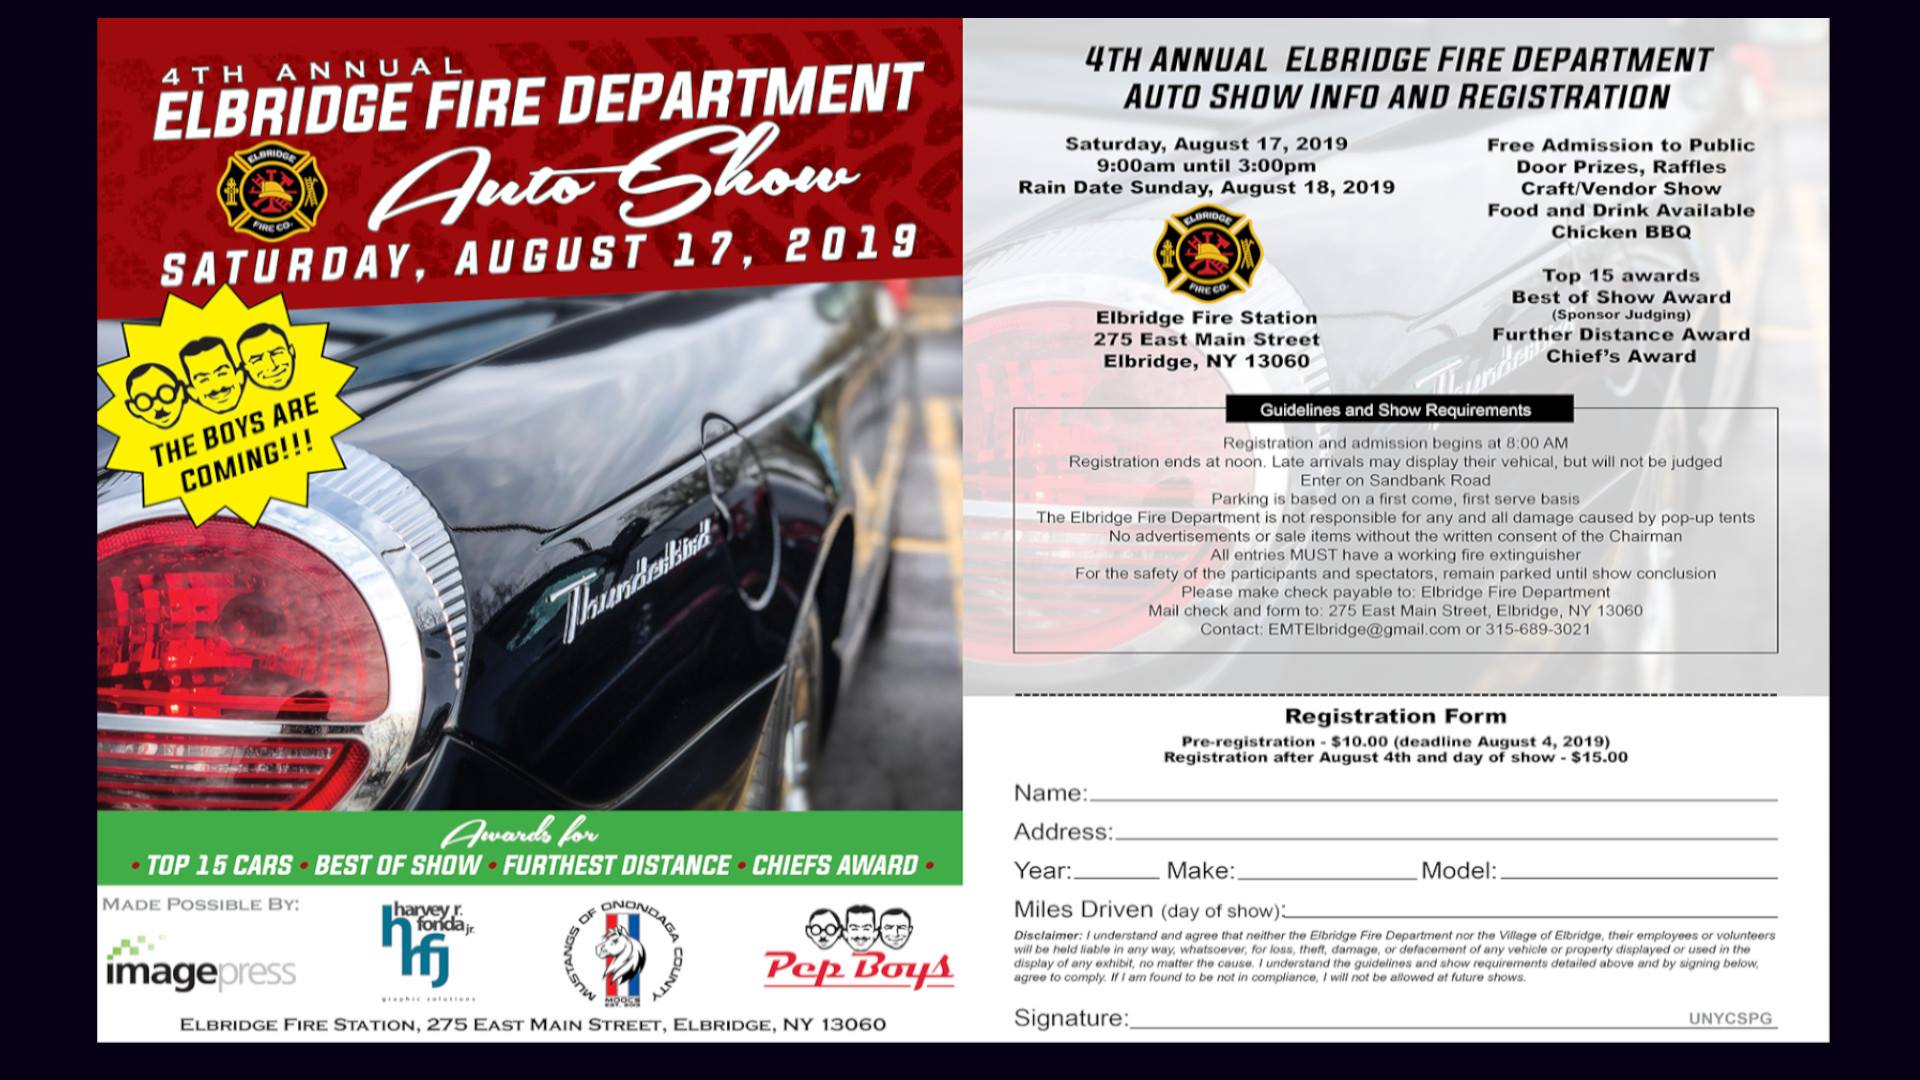 4th Annual Elbridge Fire Department Auto Show 2019   Apex